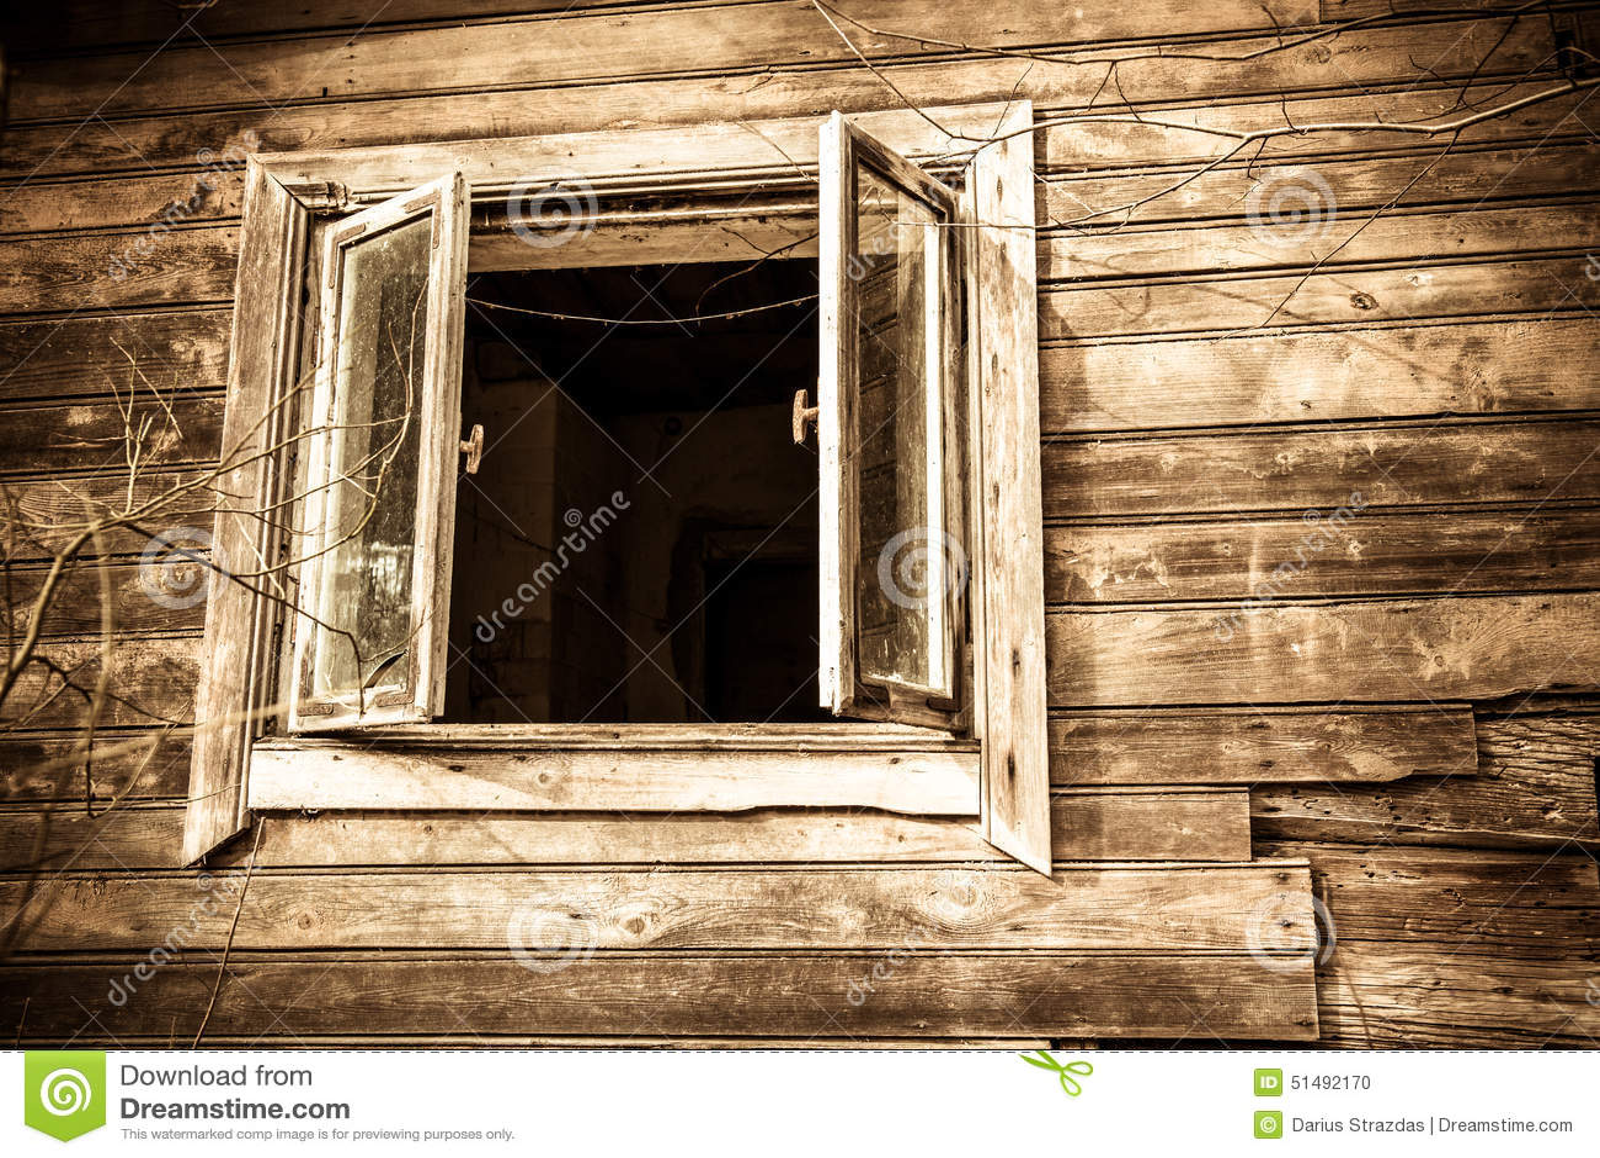 Old House Window Stock Photo - Image: 51492170